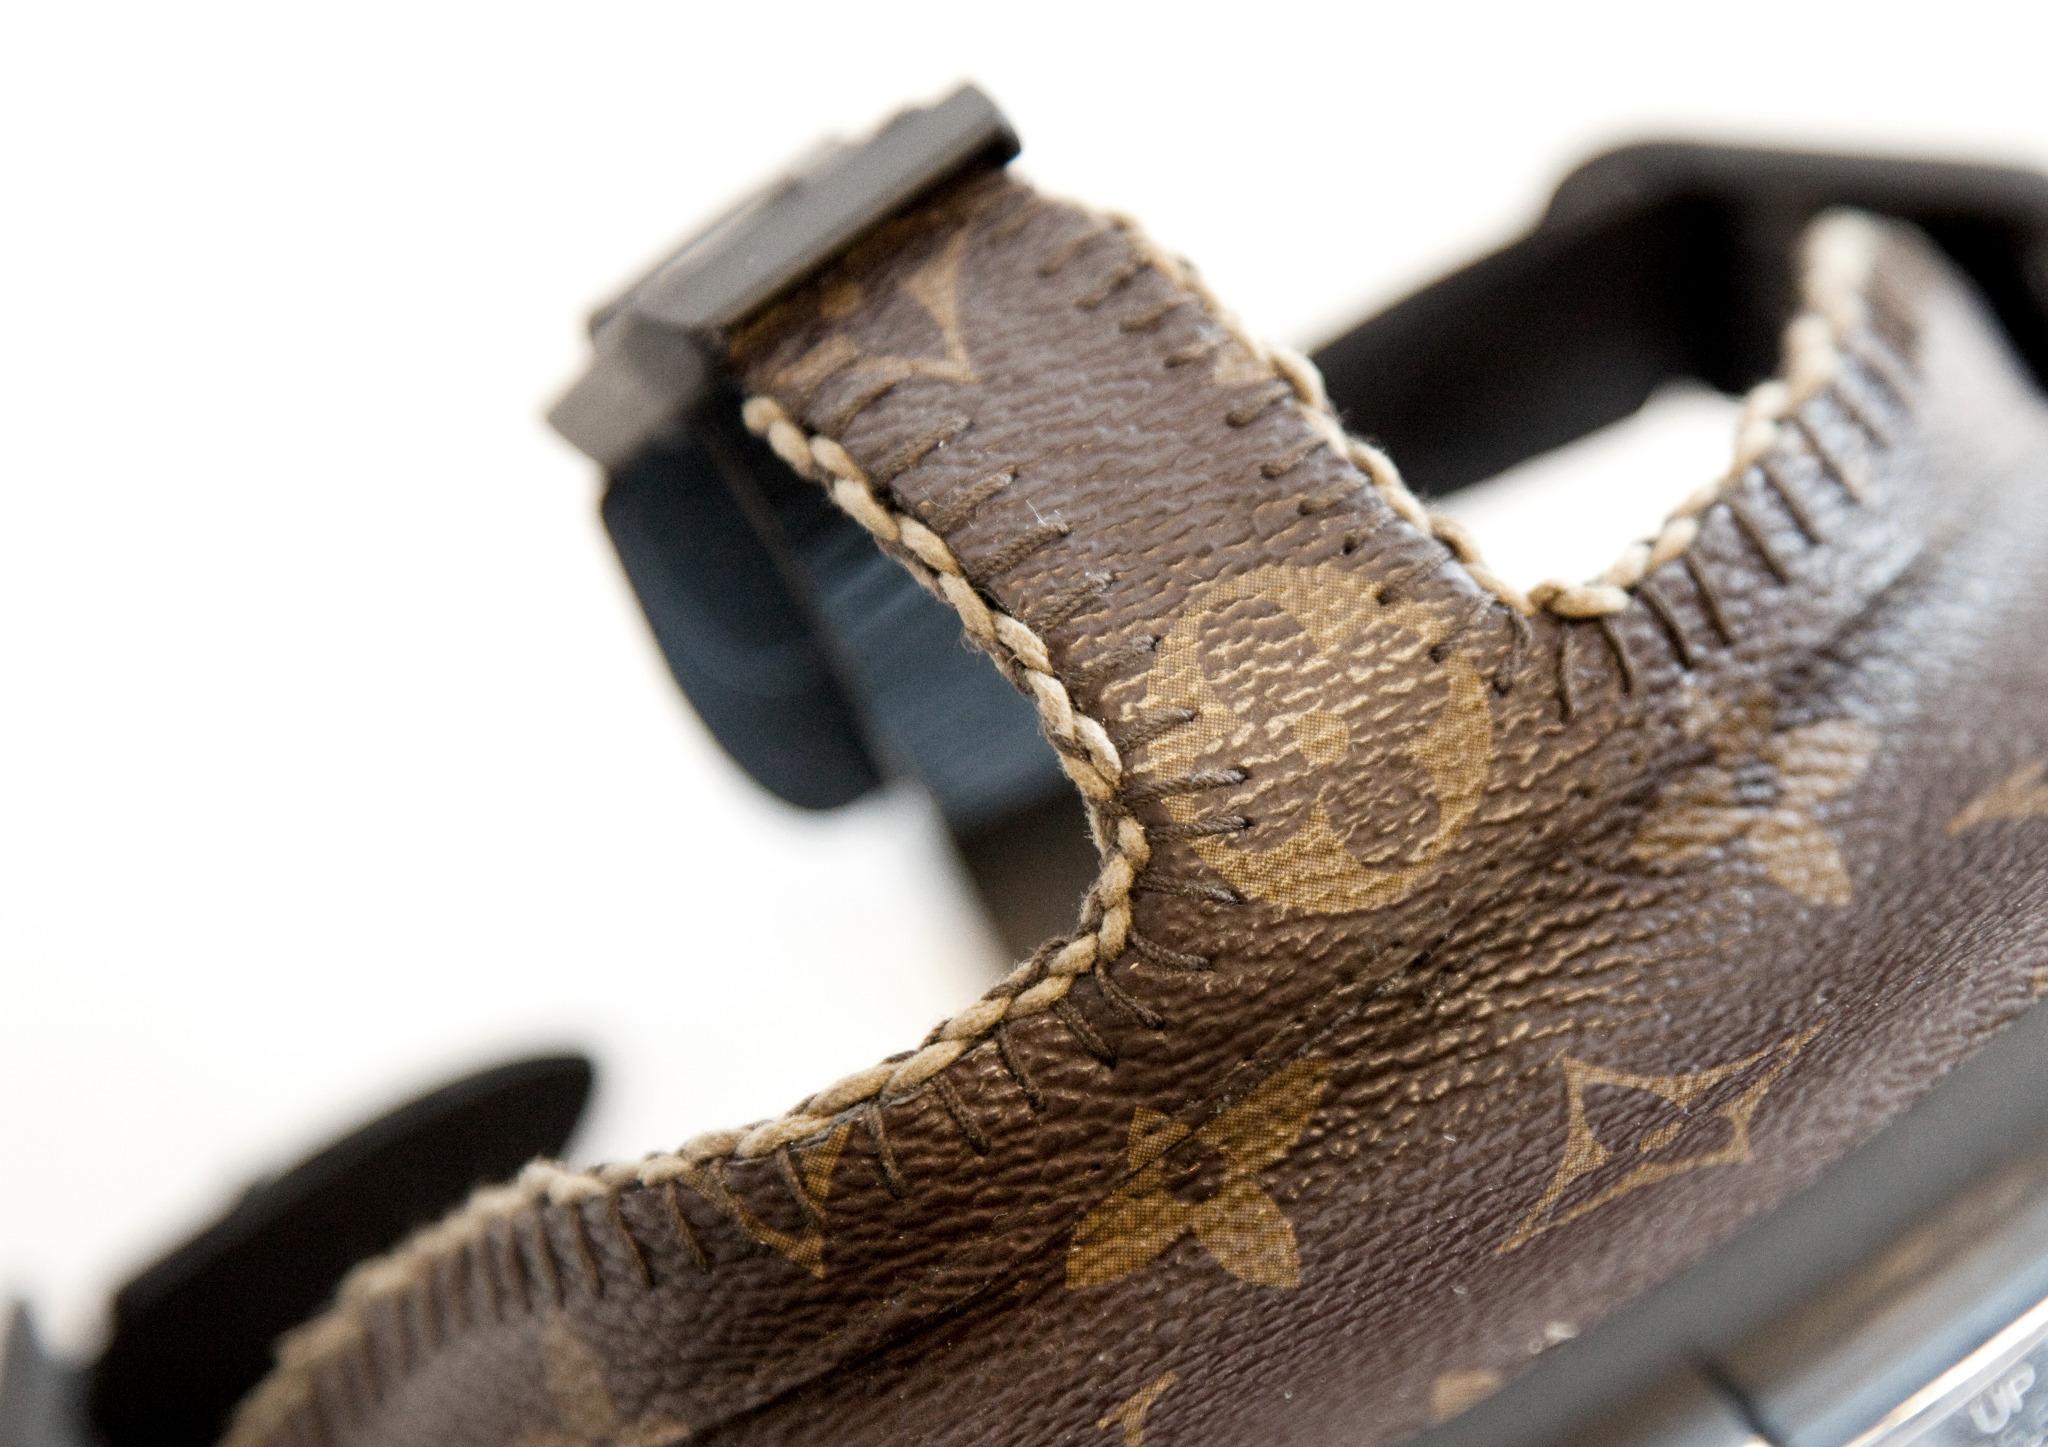 designer gas mask by Diddo close up